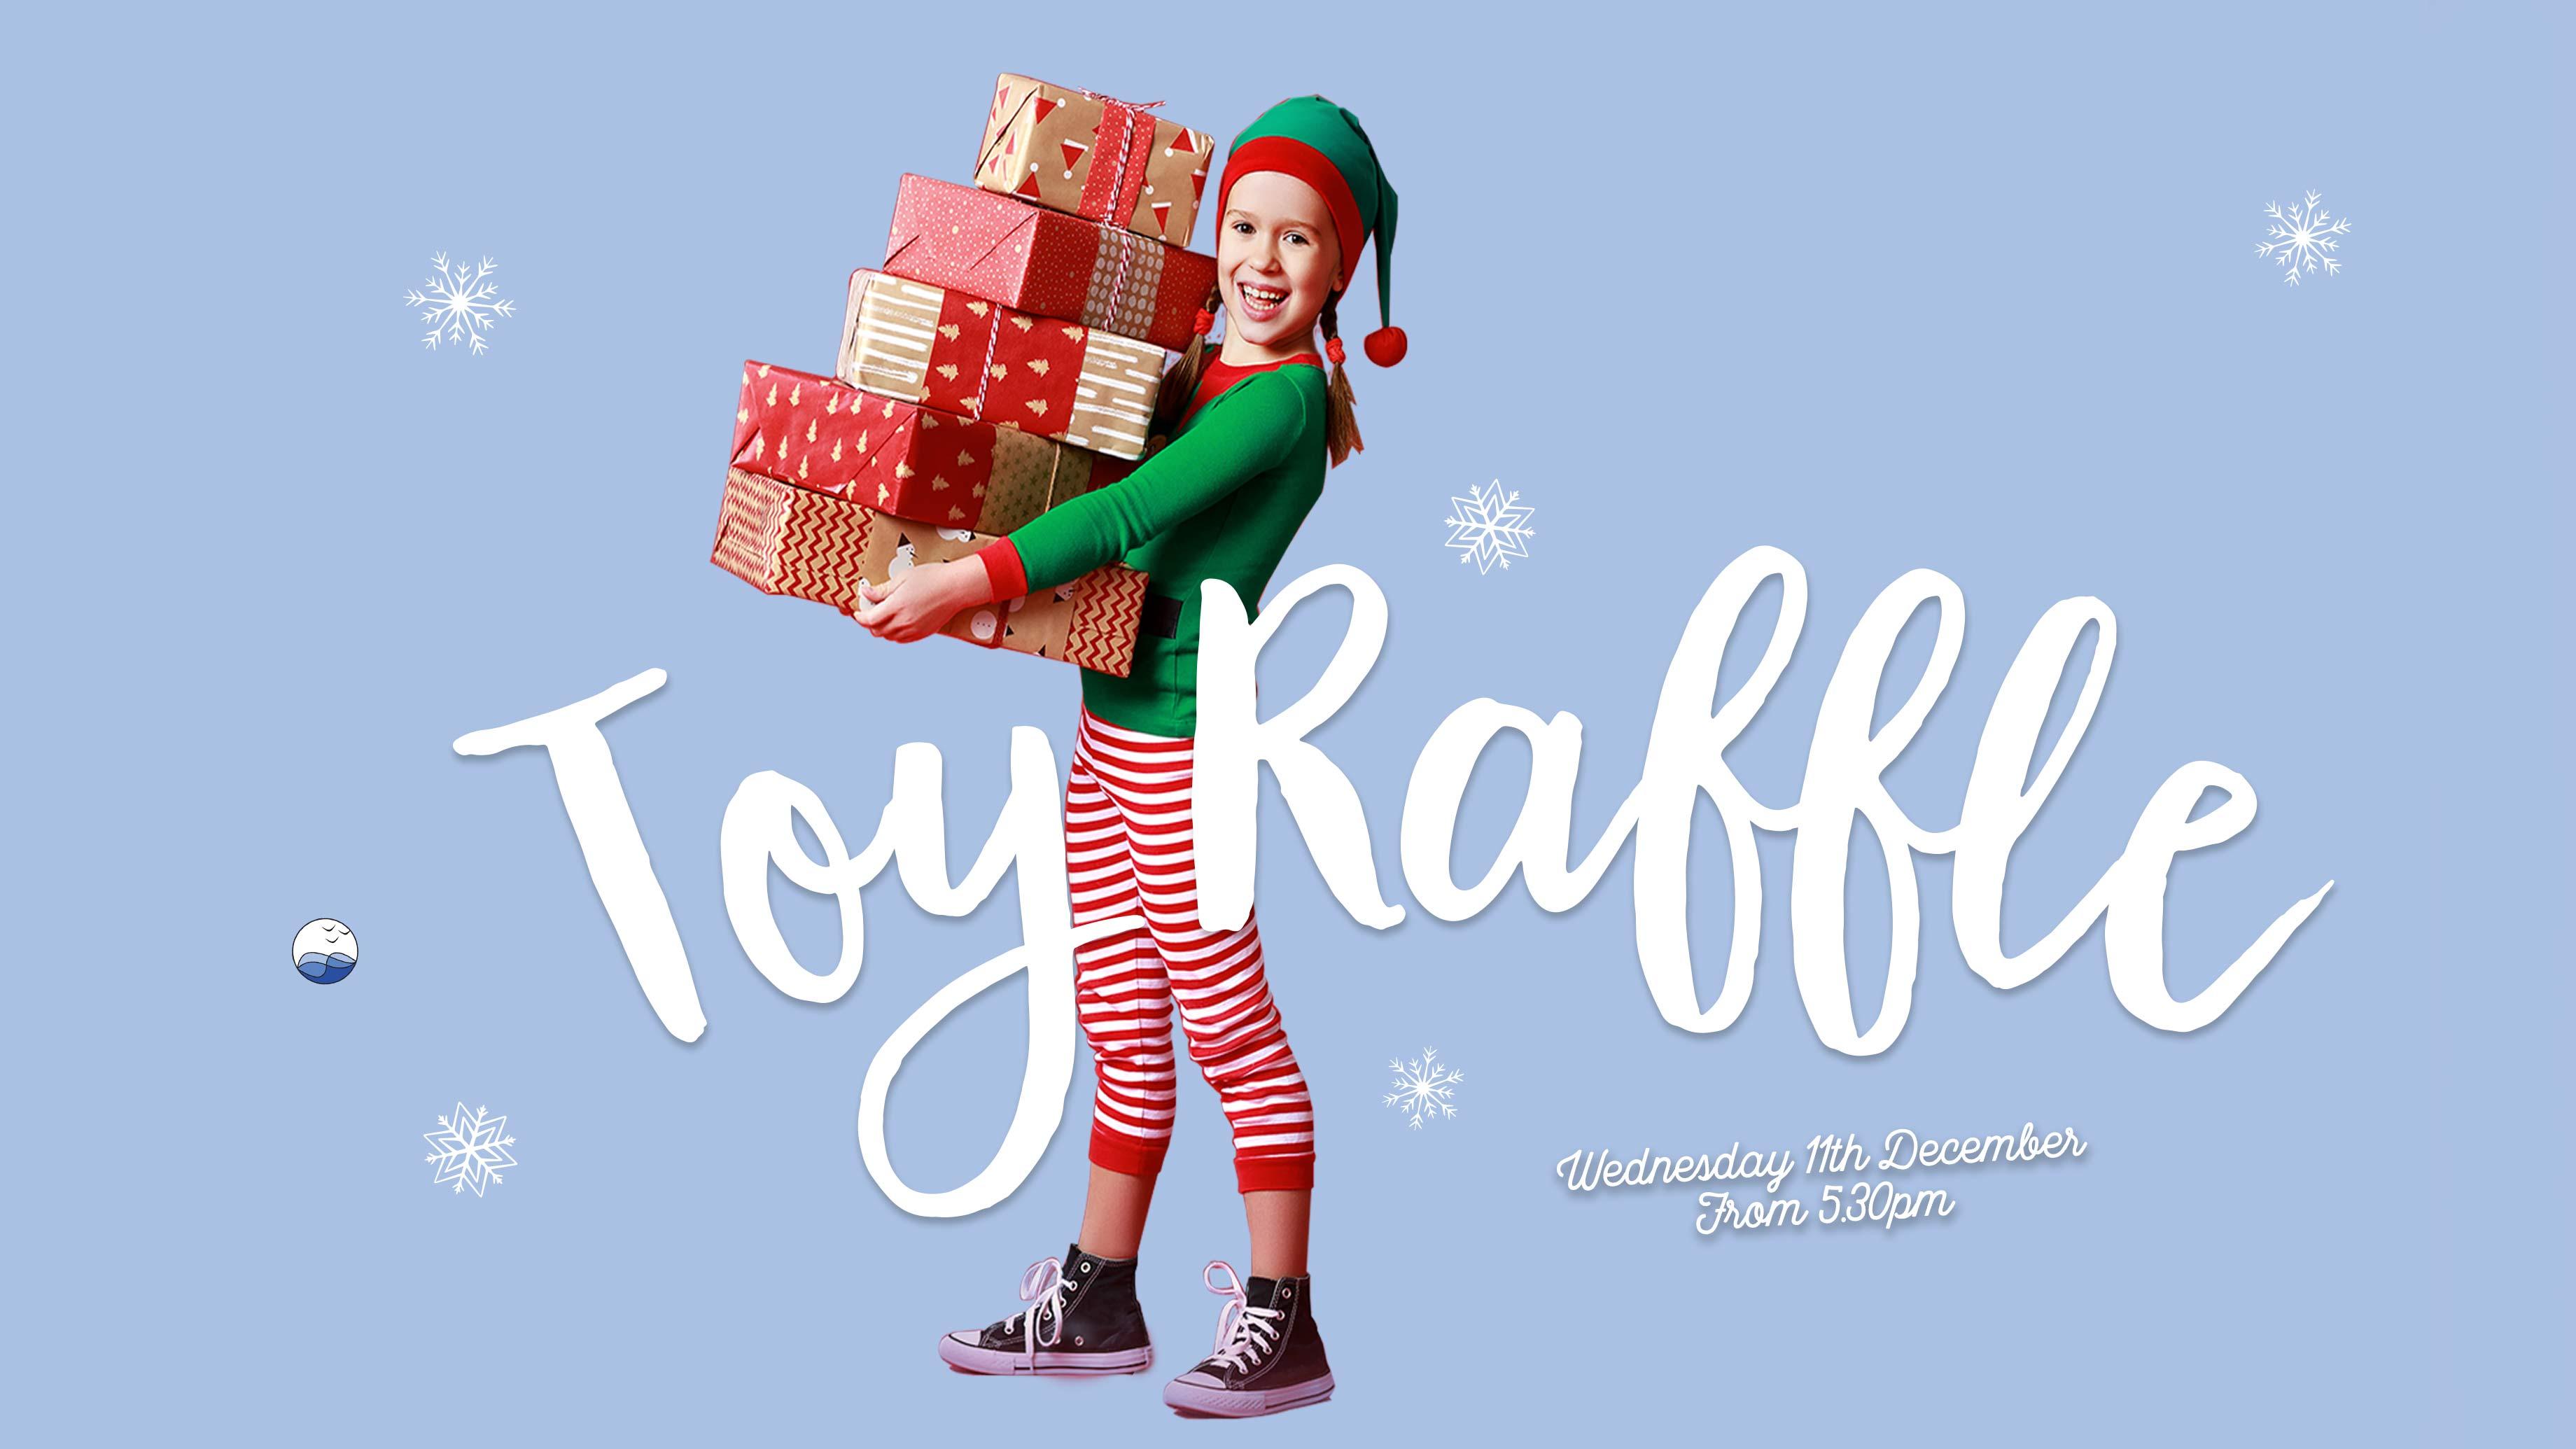 Toy raffles